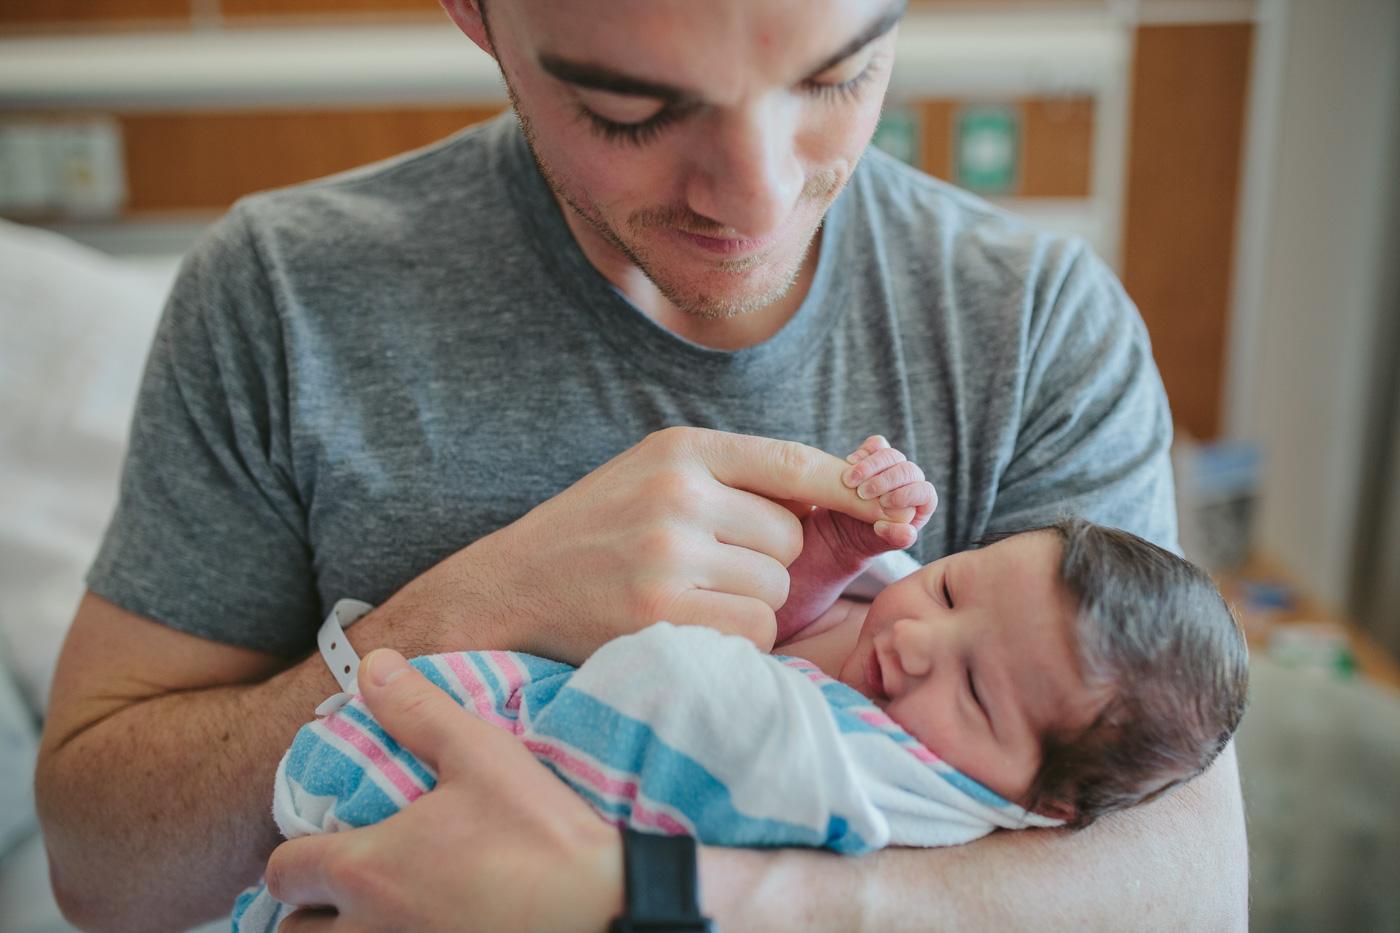 RyderCorso-hospital-newborn-83.jpg